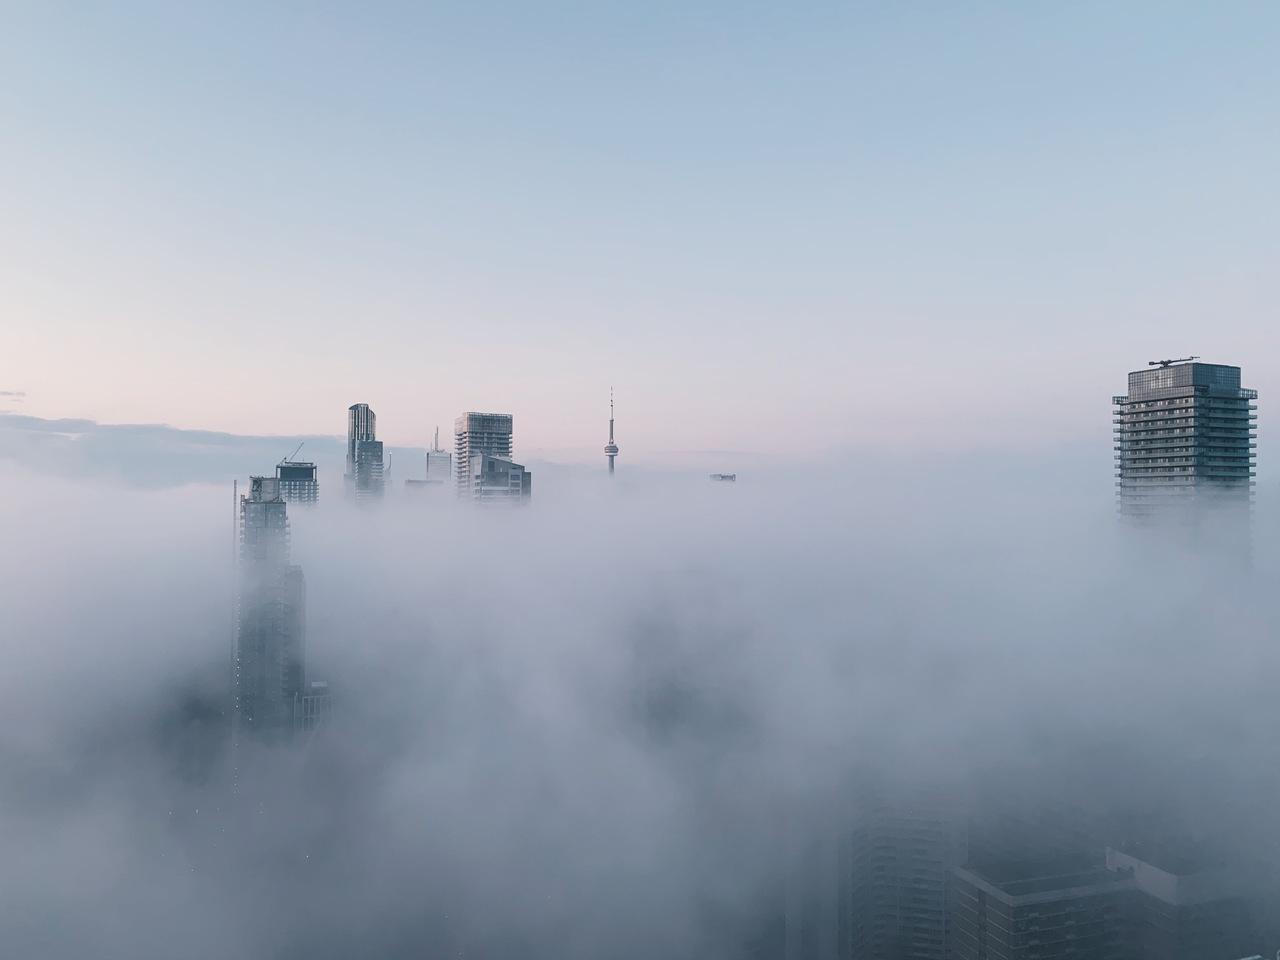 Daily Photo, Toronto, skyline, Downtown, fog, cloud, towers